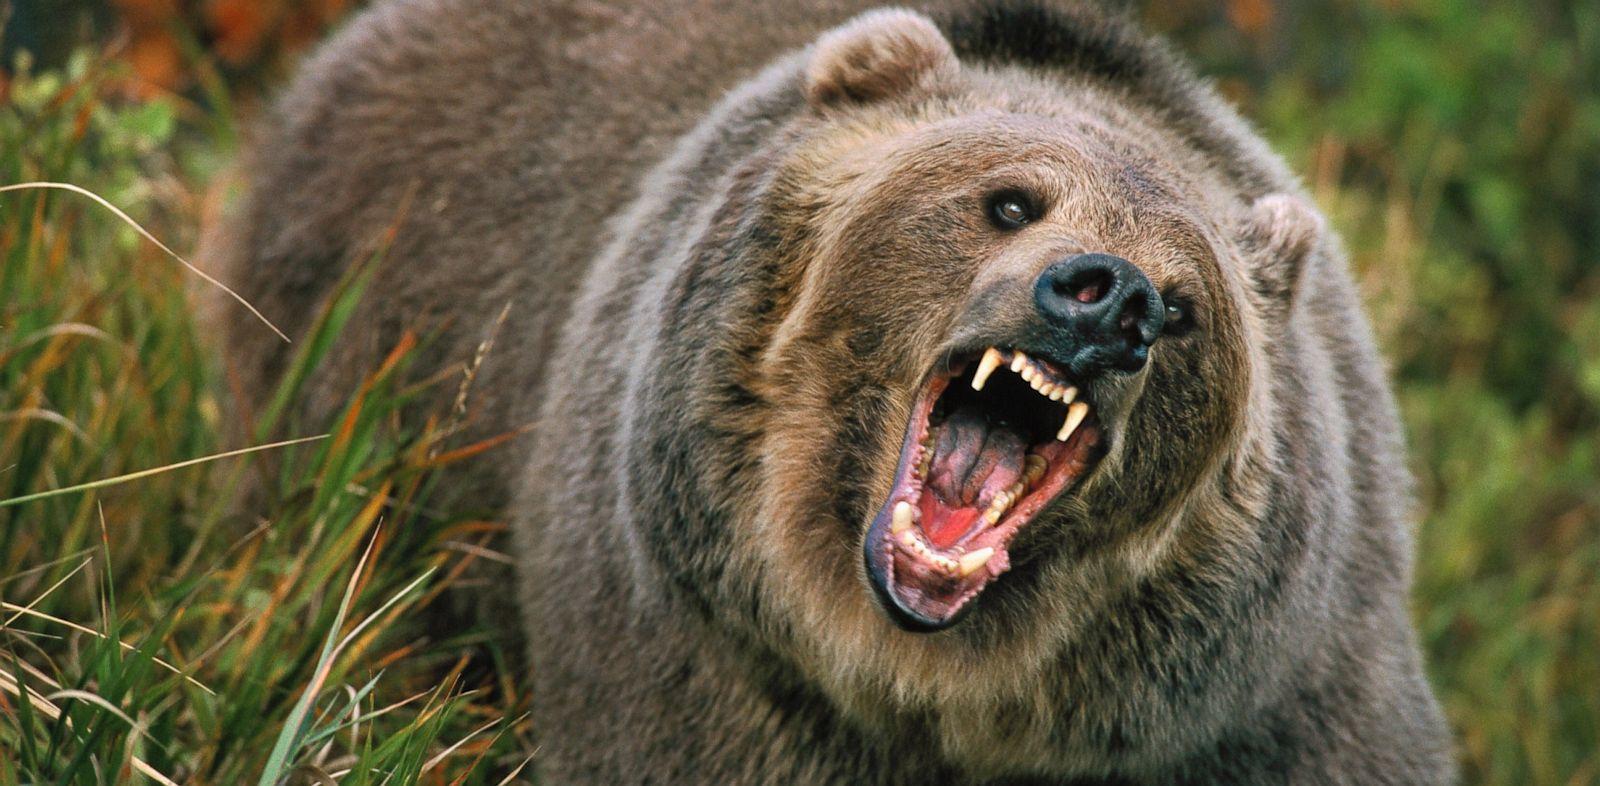 Bear Attacks Raise Safety Concerns - ABC News - photo#26